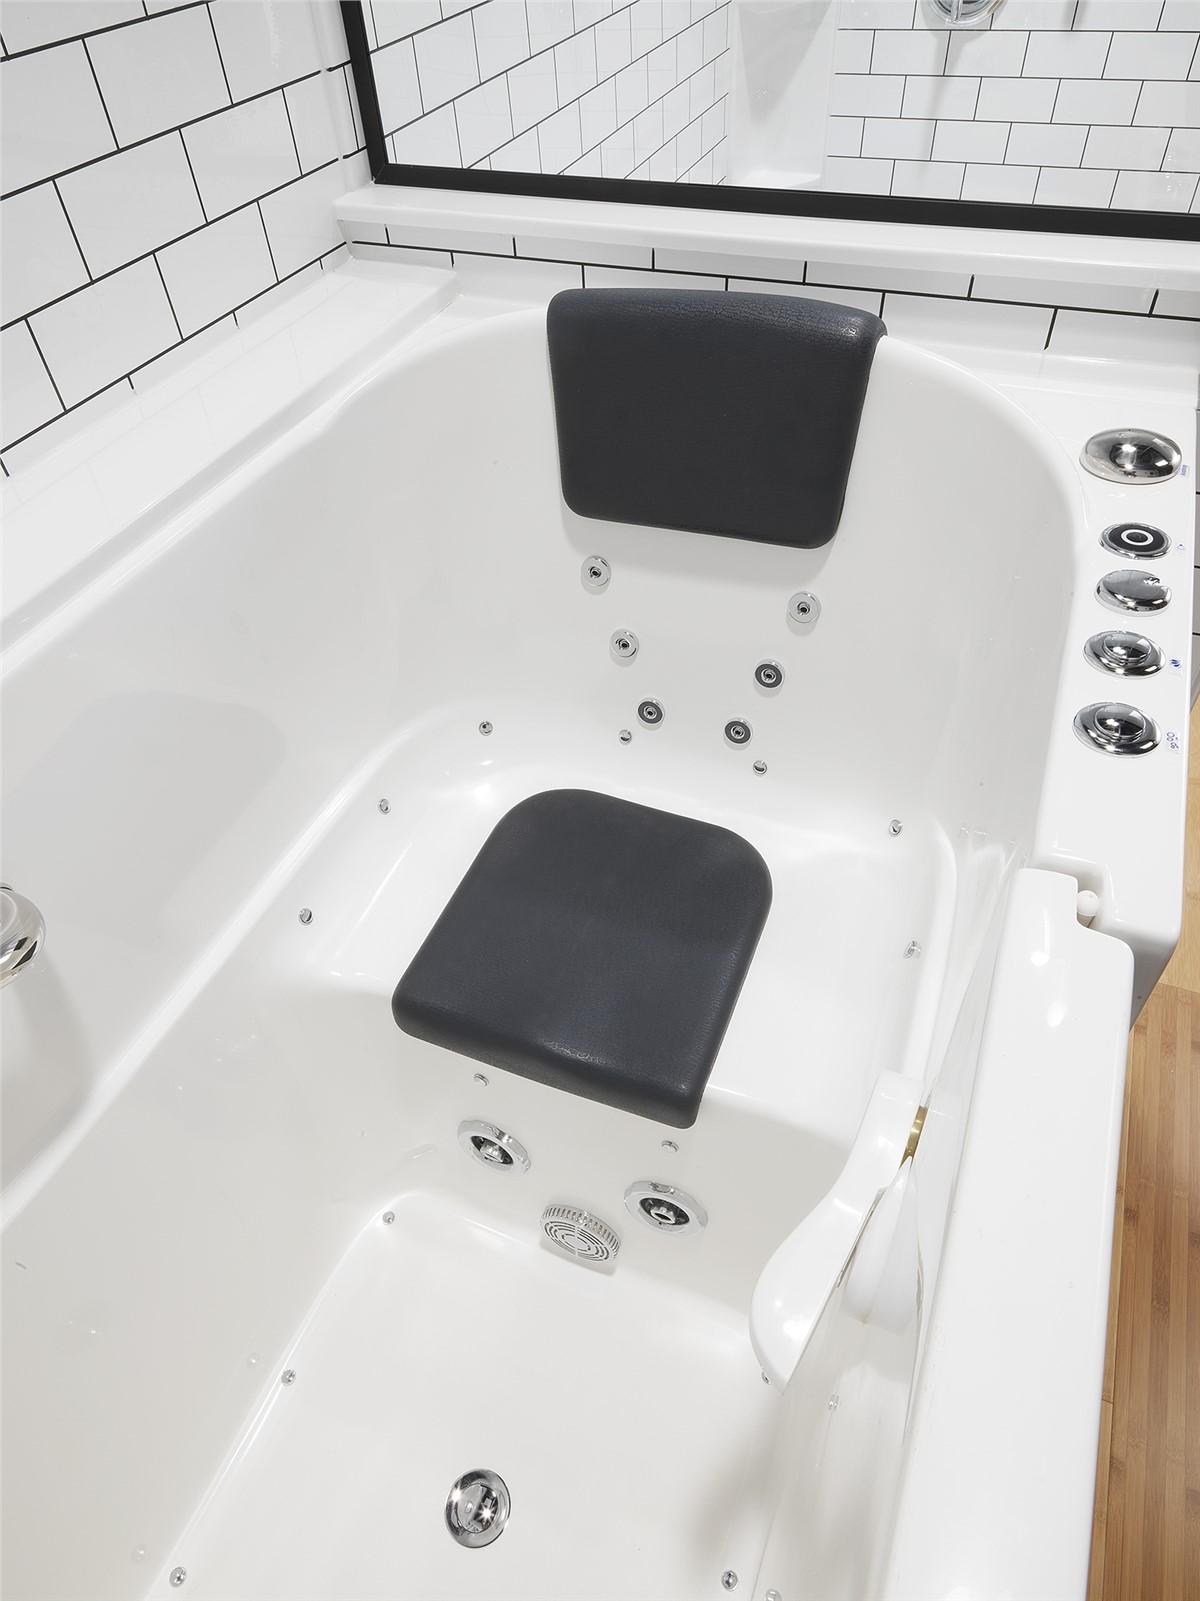 Walk In Tubs Walk In Bathtubs For Elderly Handicap Accesible Bathtubs Bath Planet